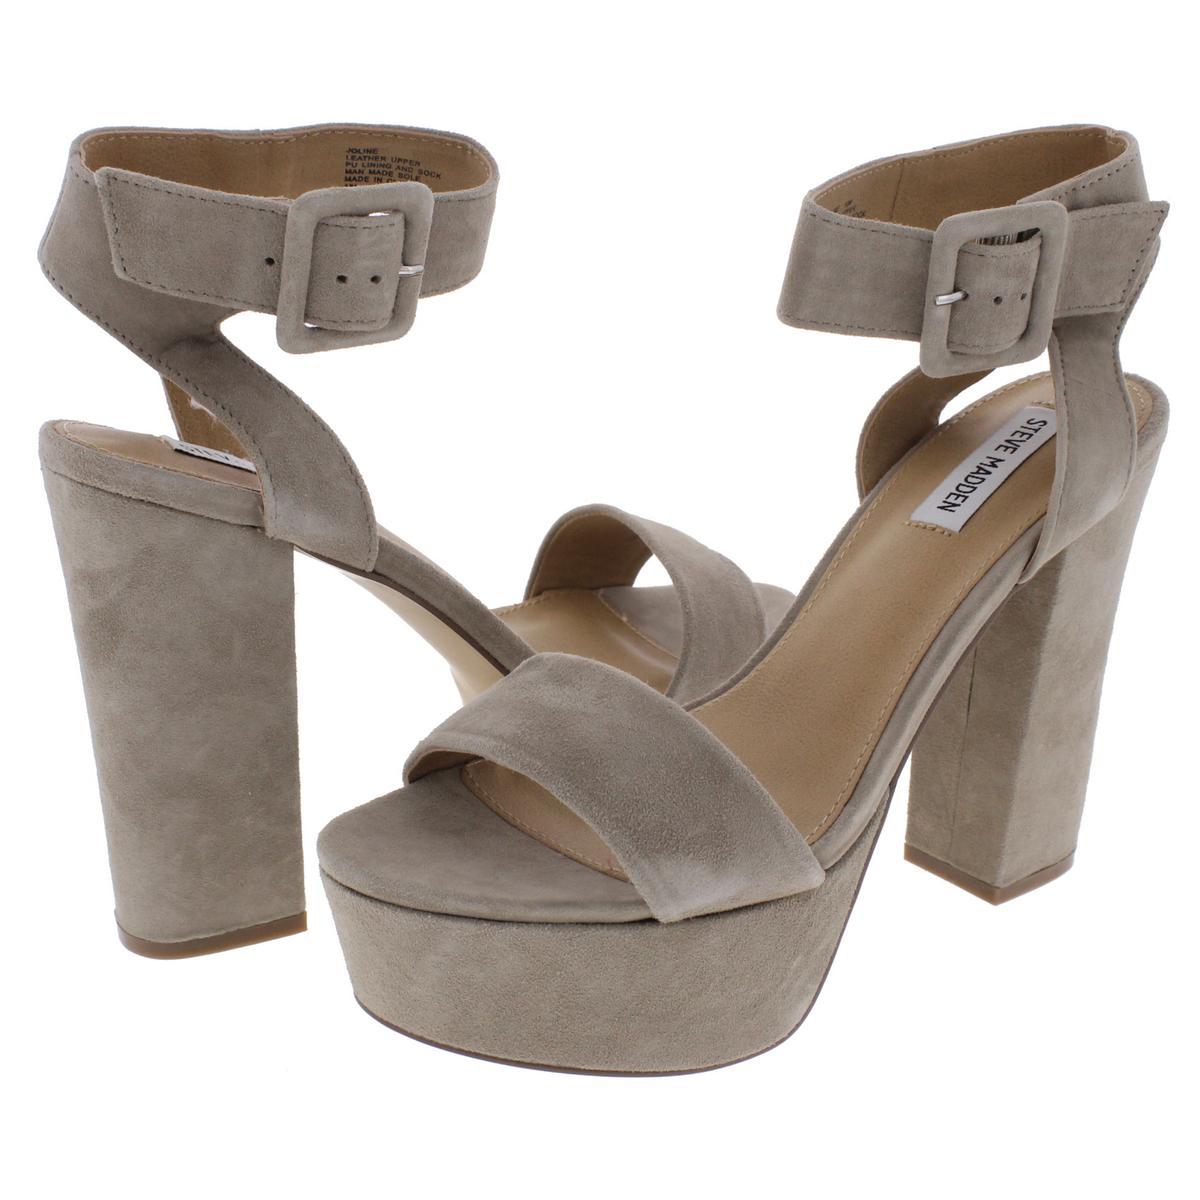 Steve-Madden-Womens-Joline-Suede-Covered-Heel-Platform-Sandals-Shoes-BHFO-8617 thumbnail 9